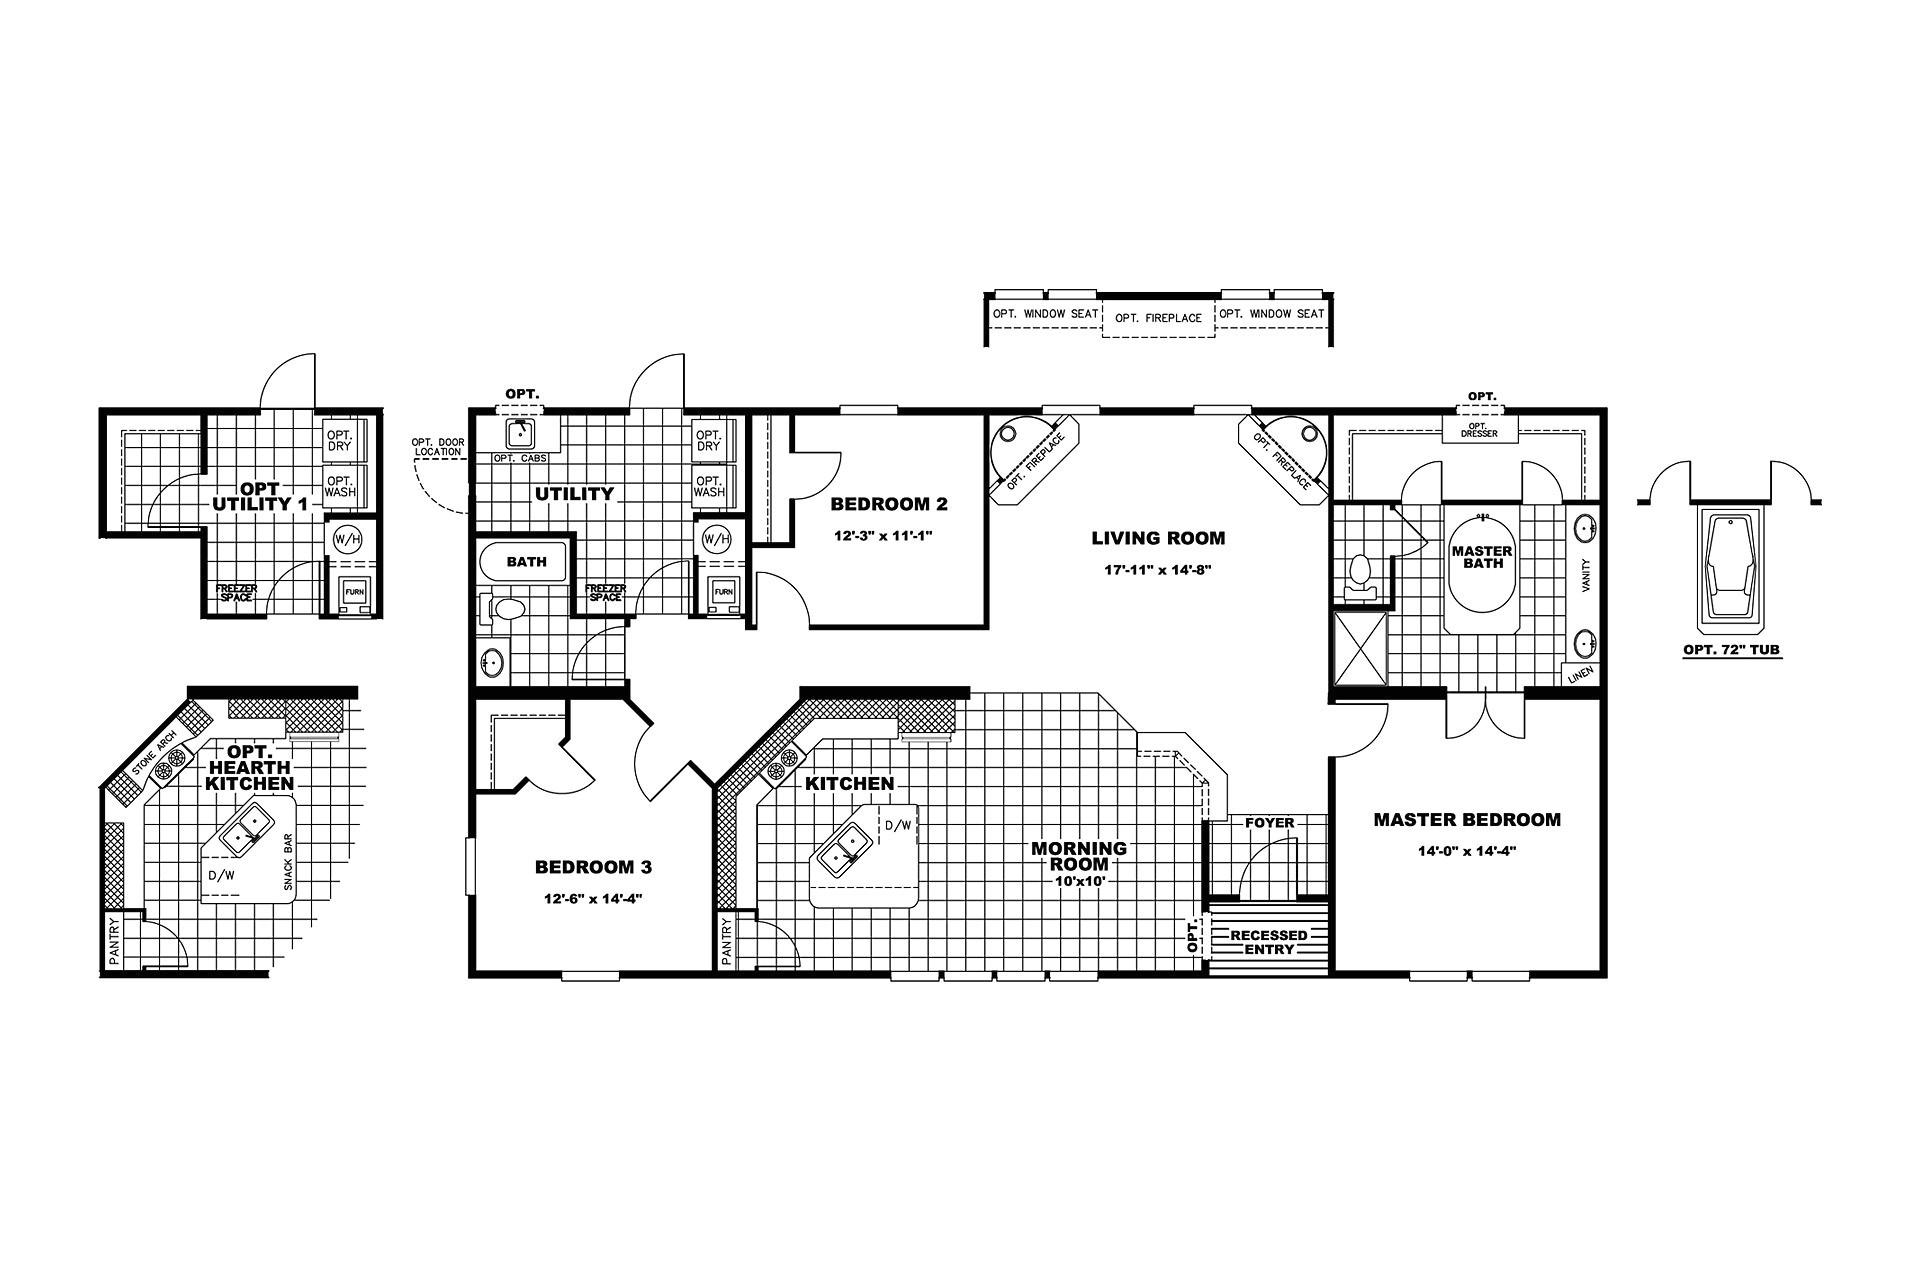 manufacturedhomefloorplan floorplan 5185 state tx city marshall